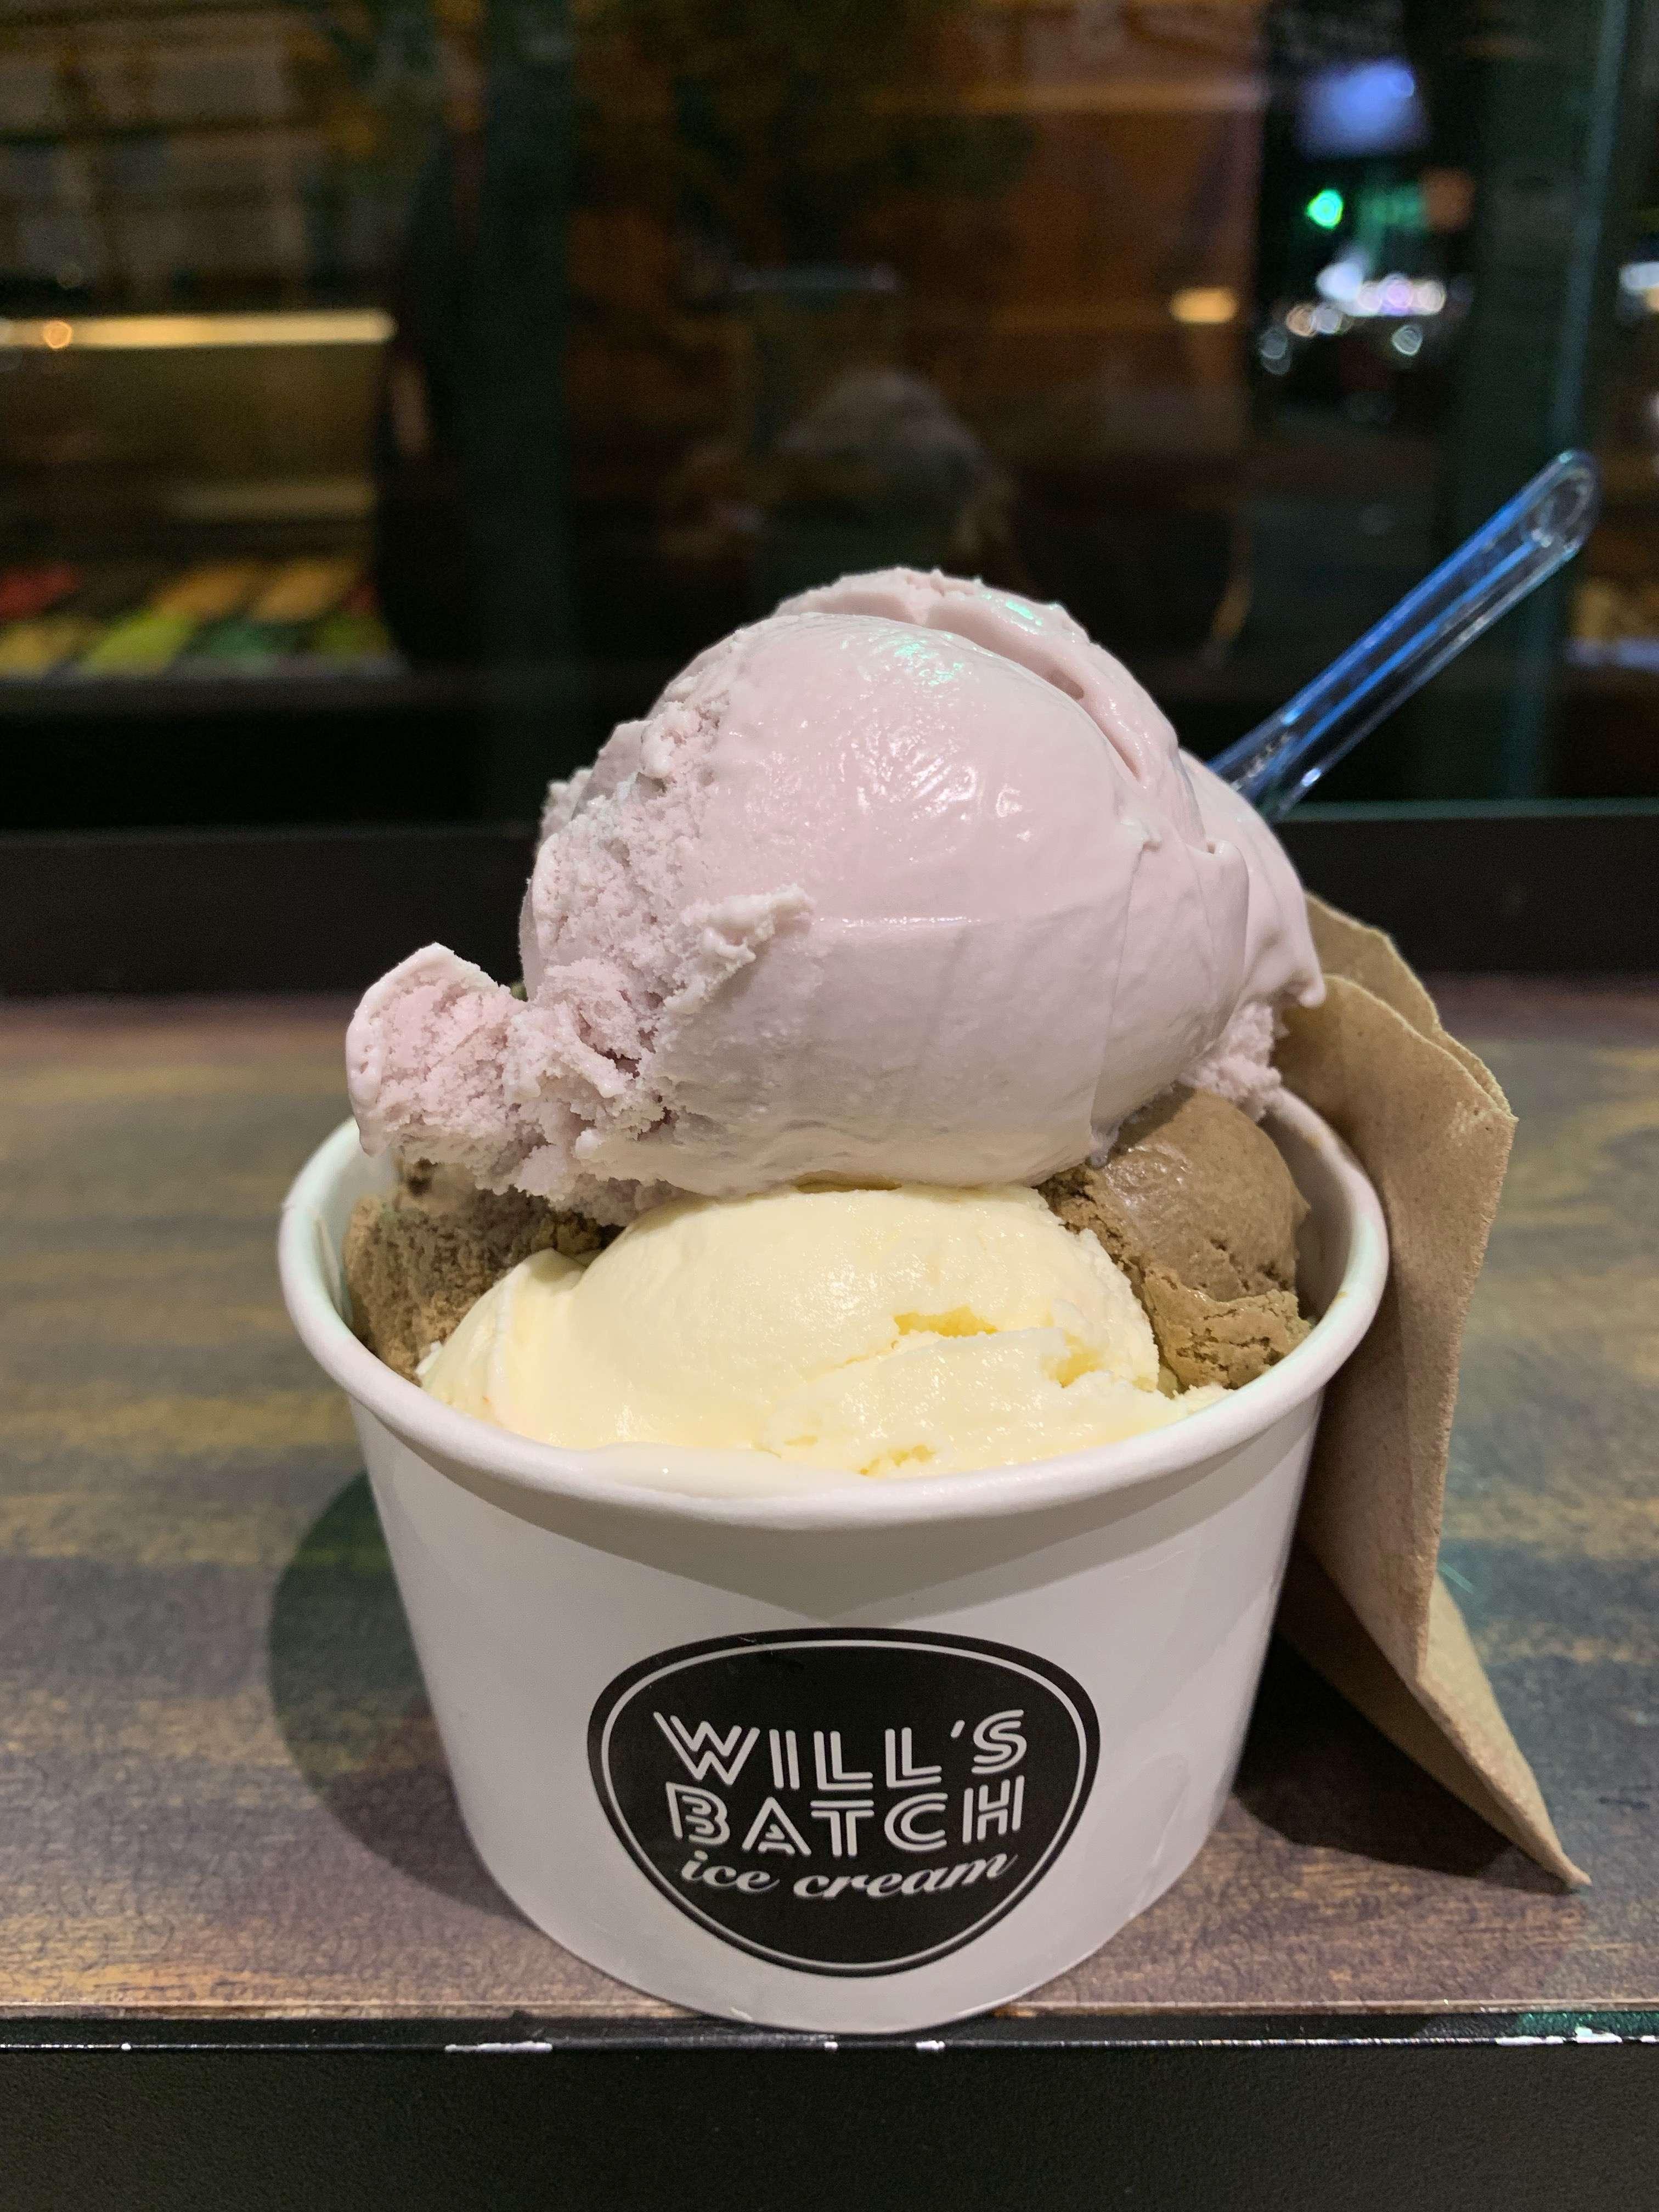 Will's Batch Ice Cream